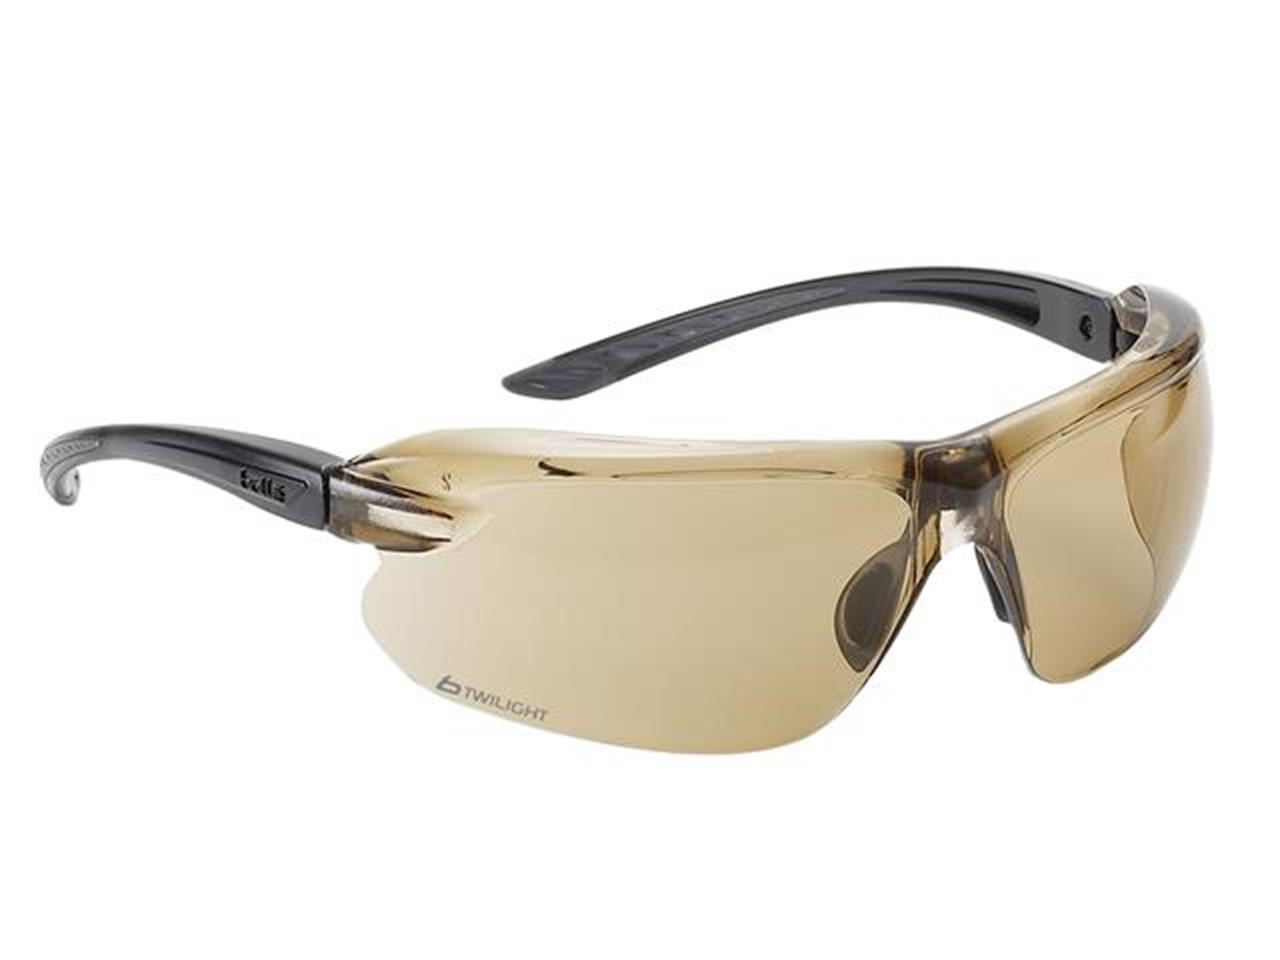 9e921bd1db Bolle IRITWI IRI-s Platinum Safety Glasses Twilight